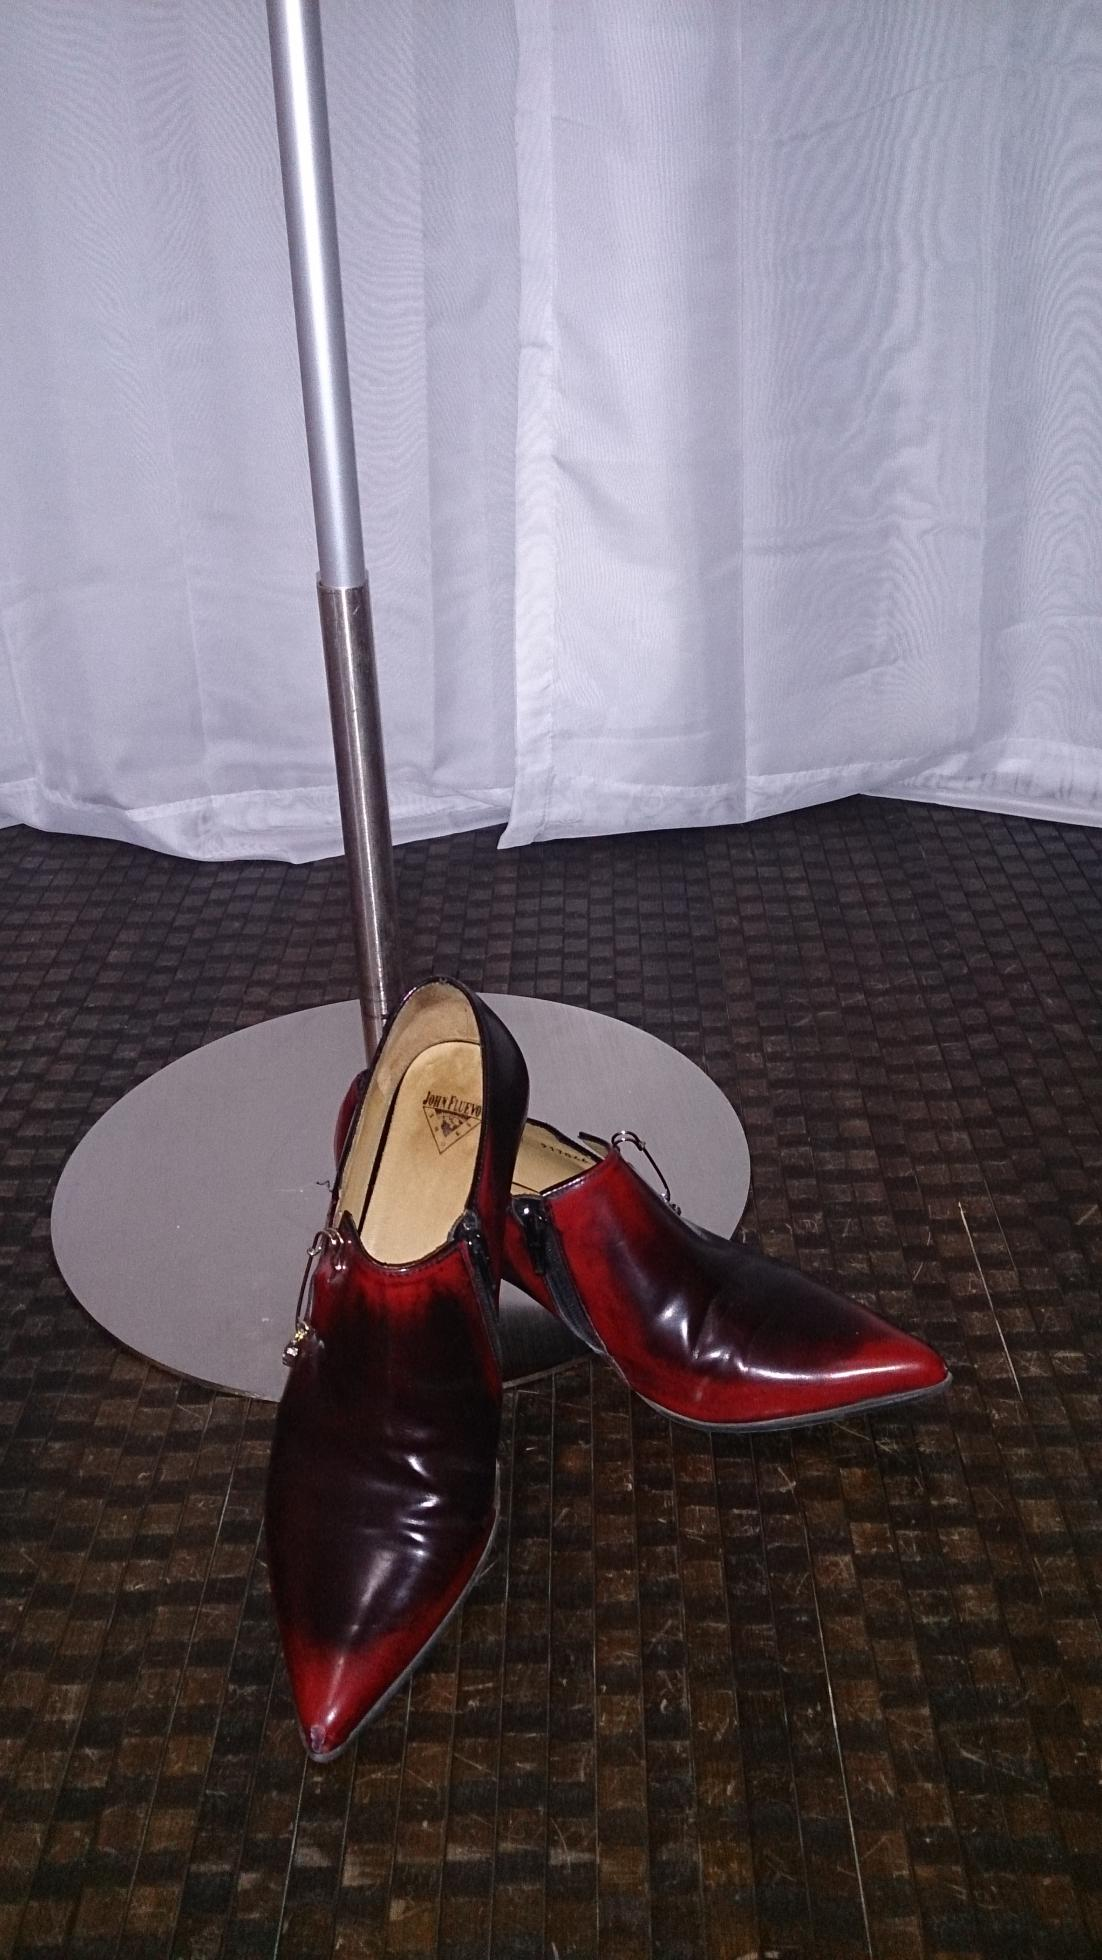 2015-06-29 Fluevog Western style shoe